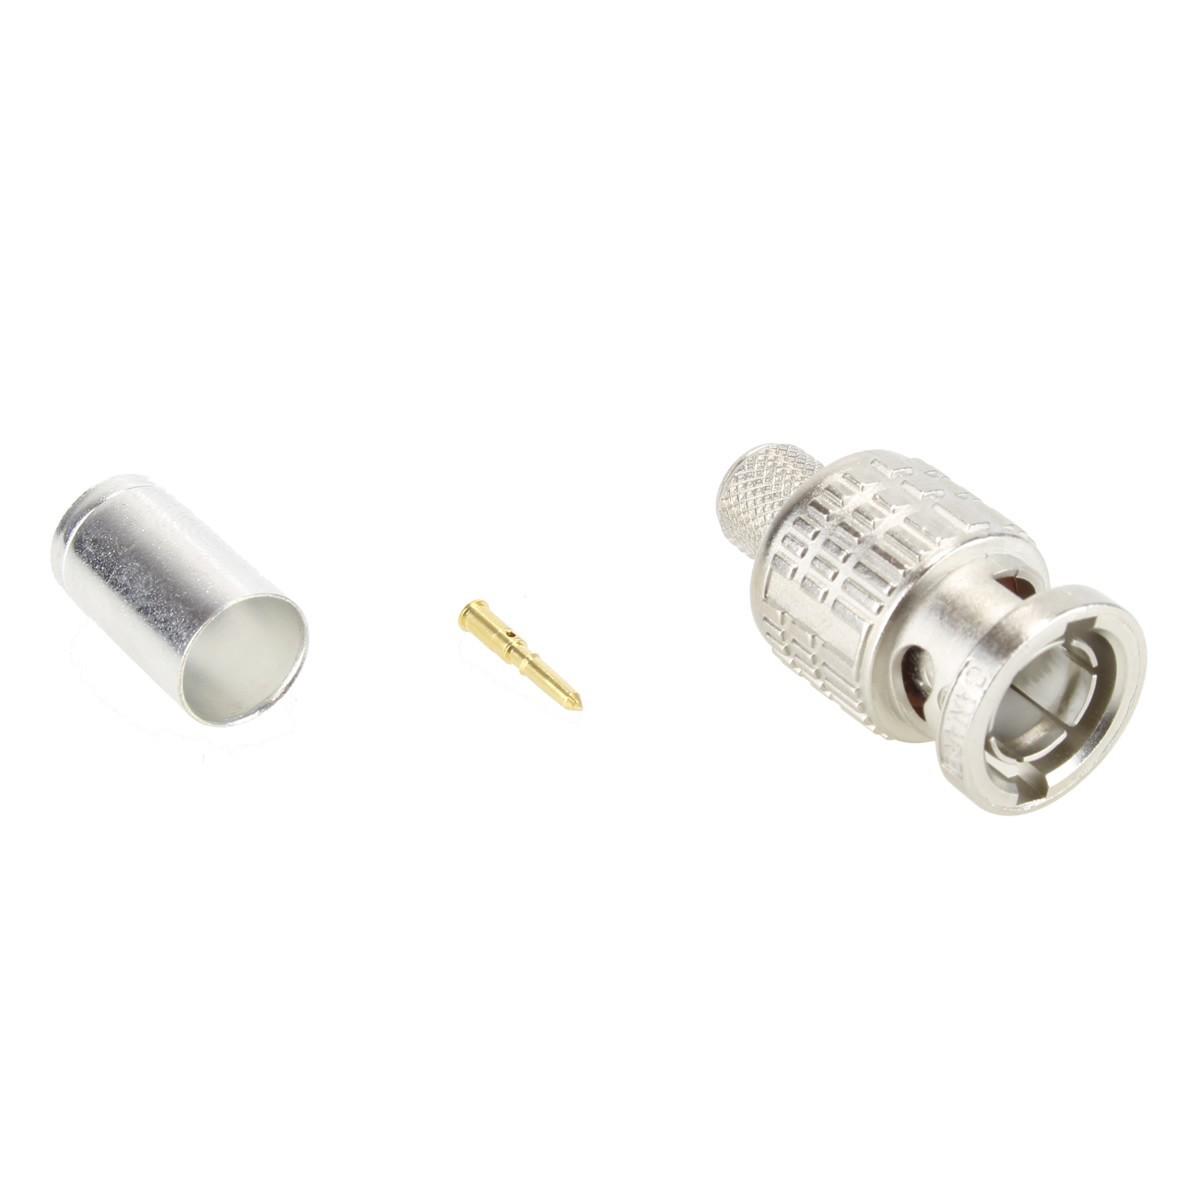 CANARE BCP-B5F High performance 75 Ohm BNC Crimp Plug Ø5mm